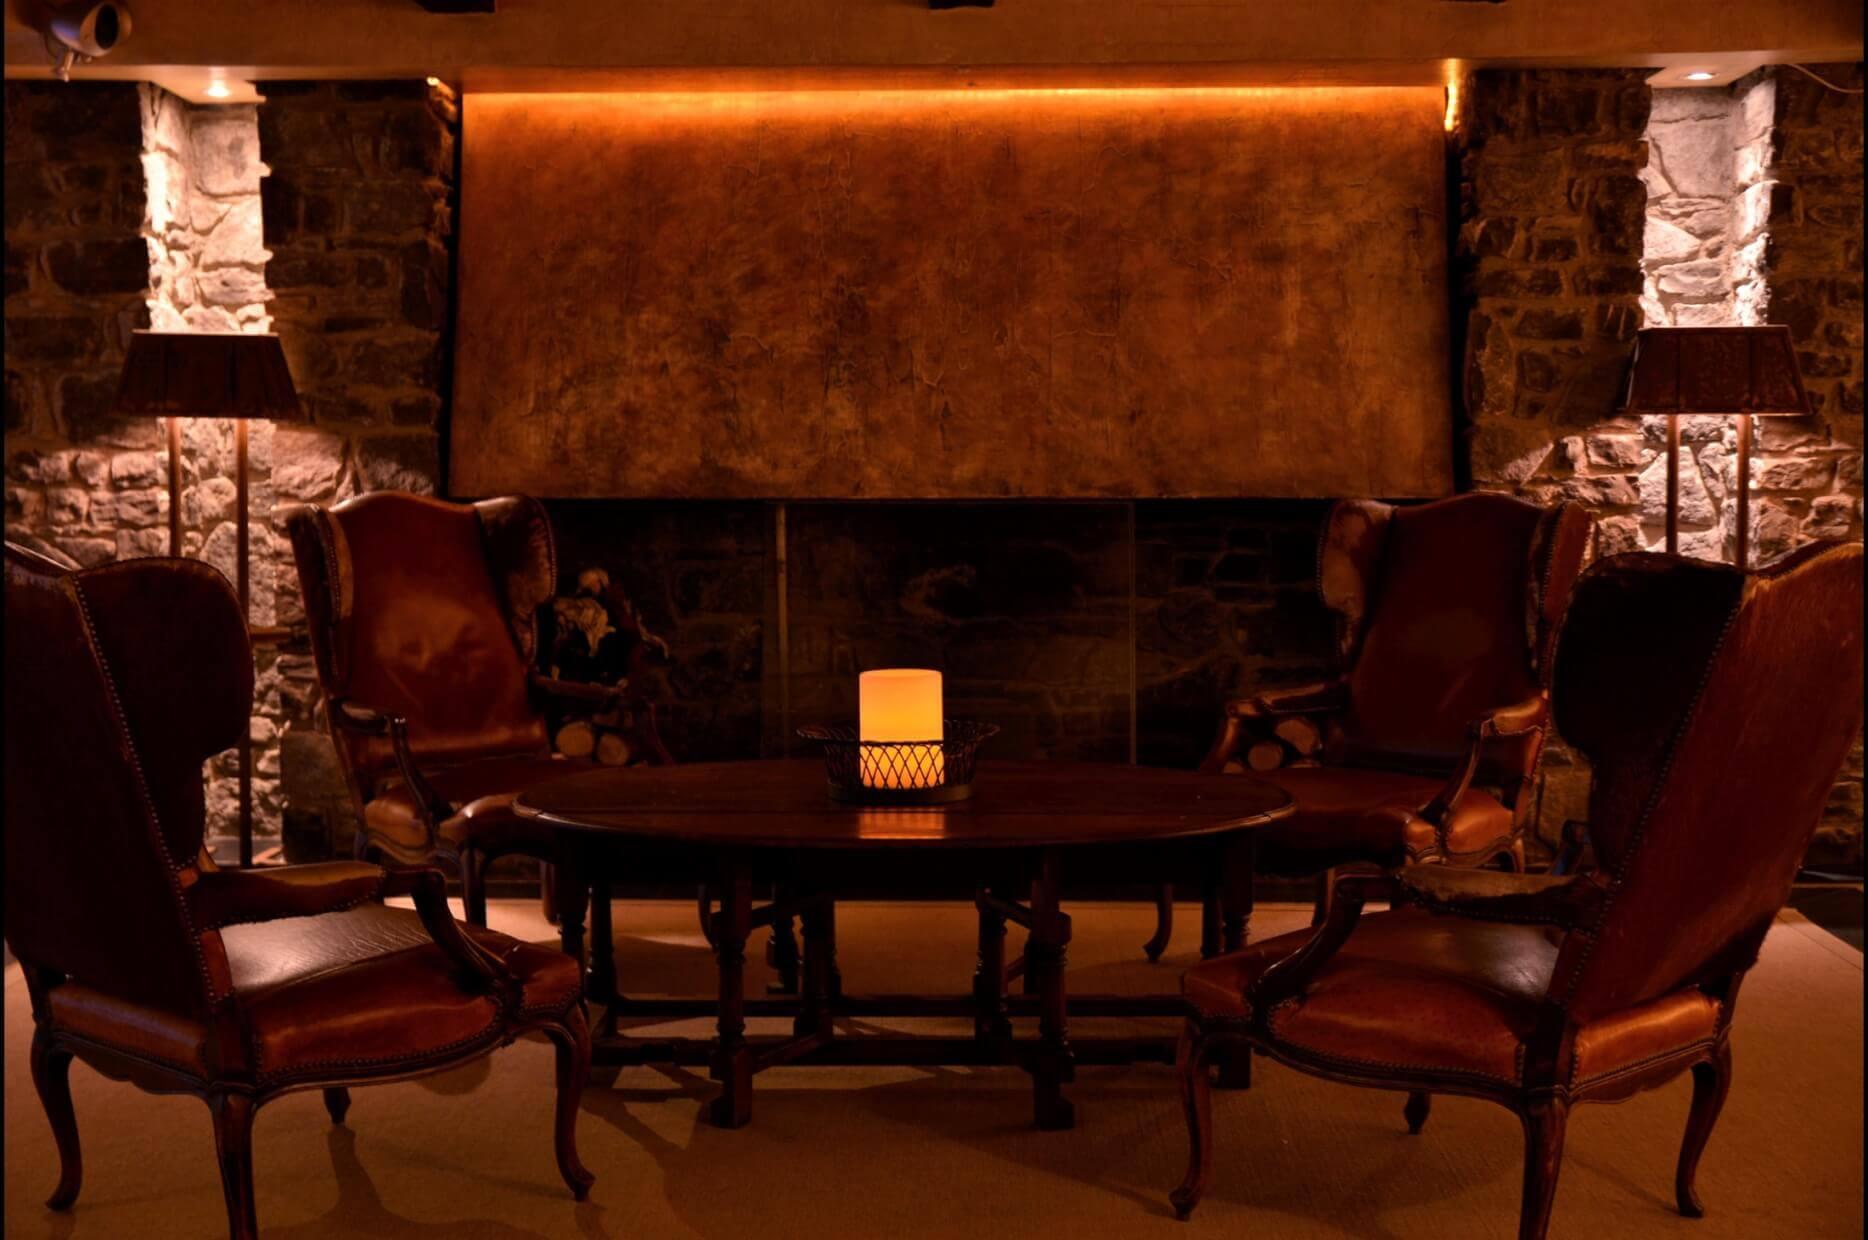 Patagonia-Salon-chimenea